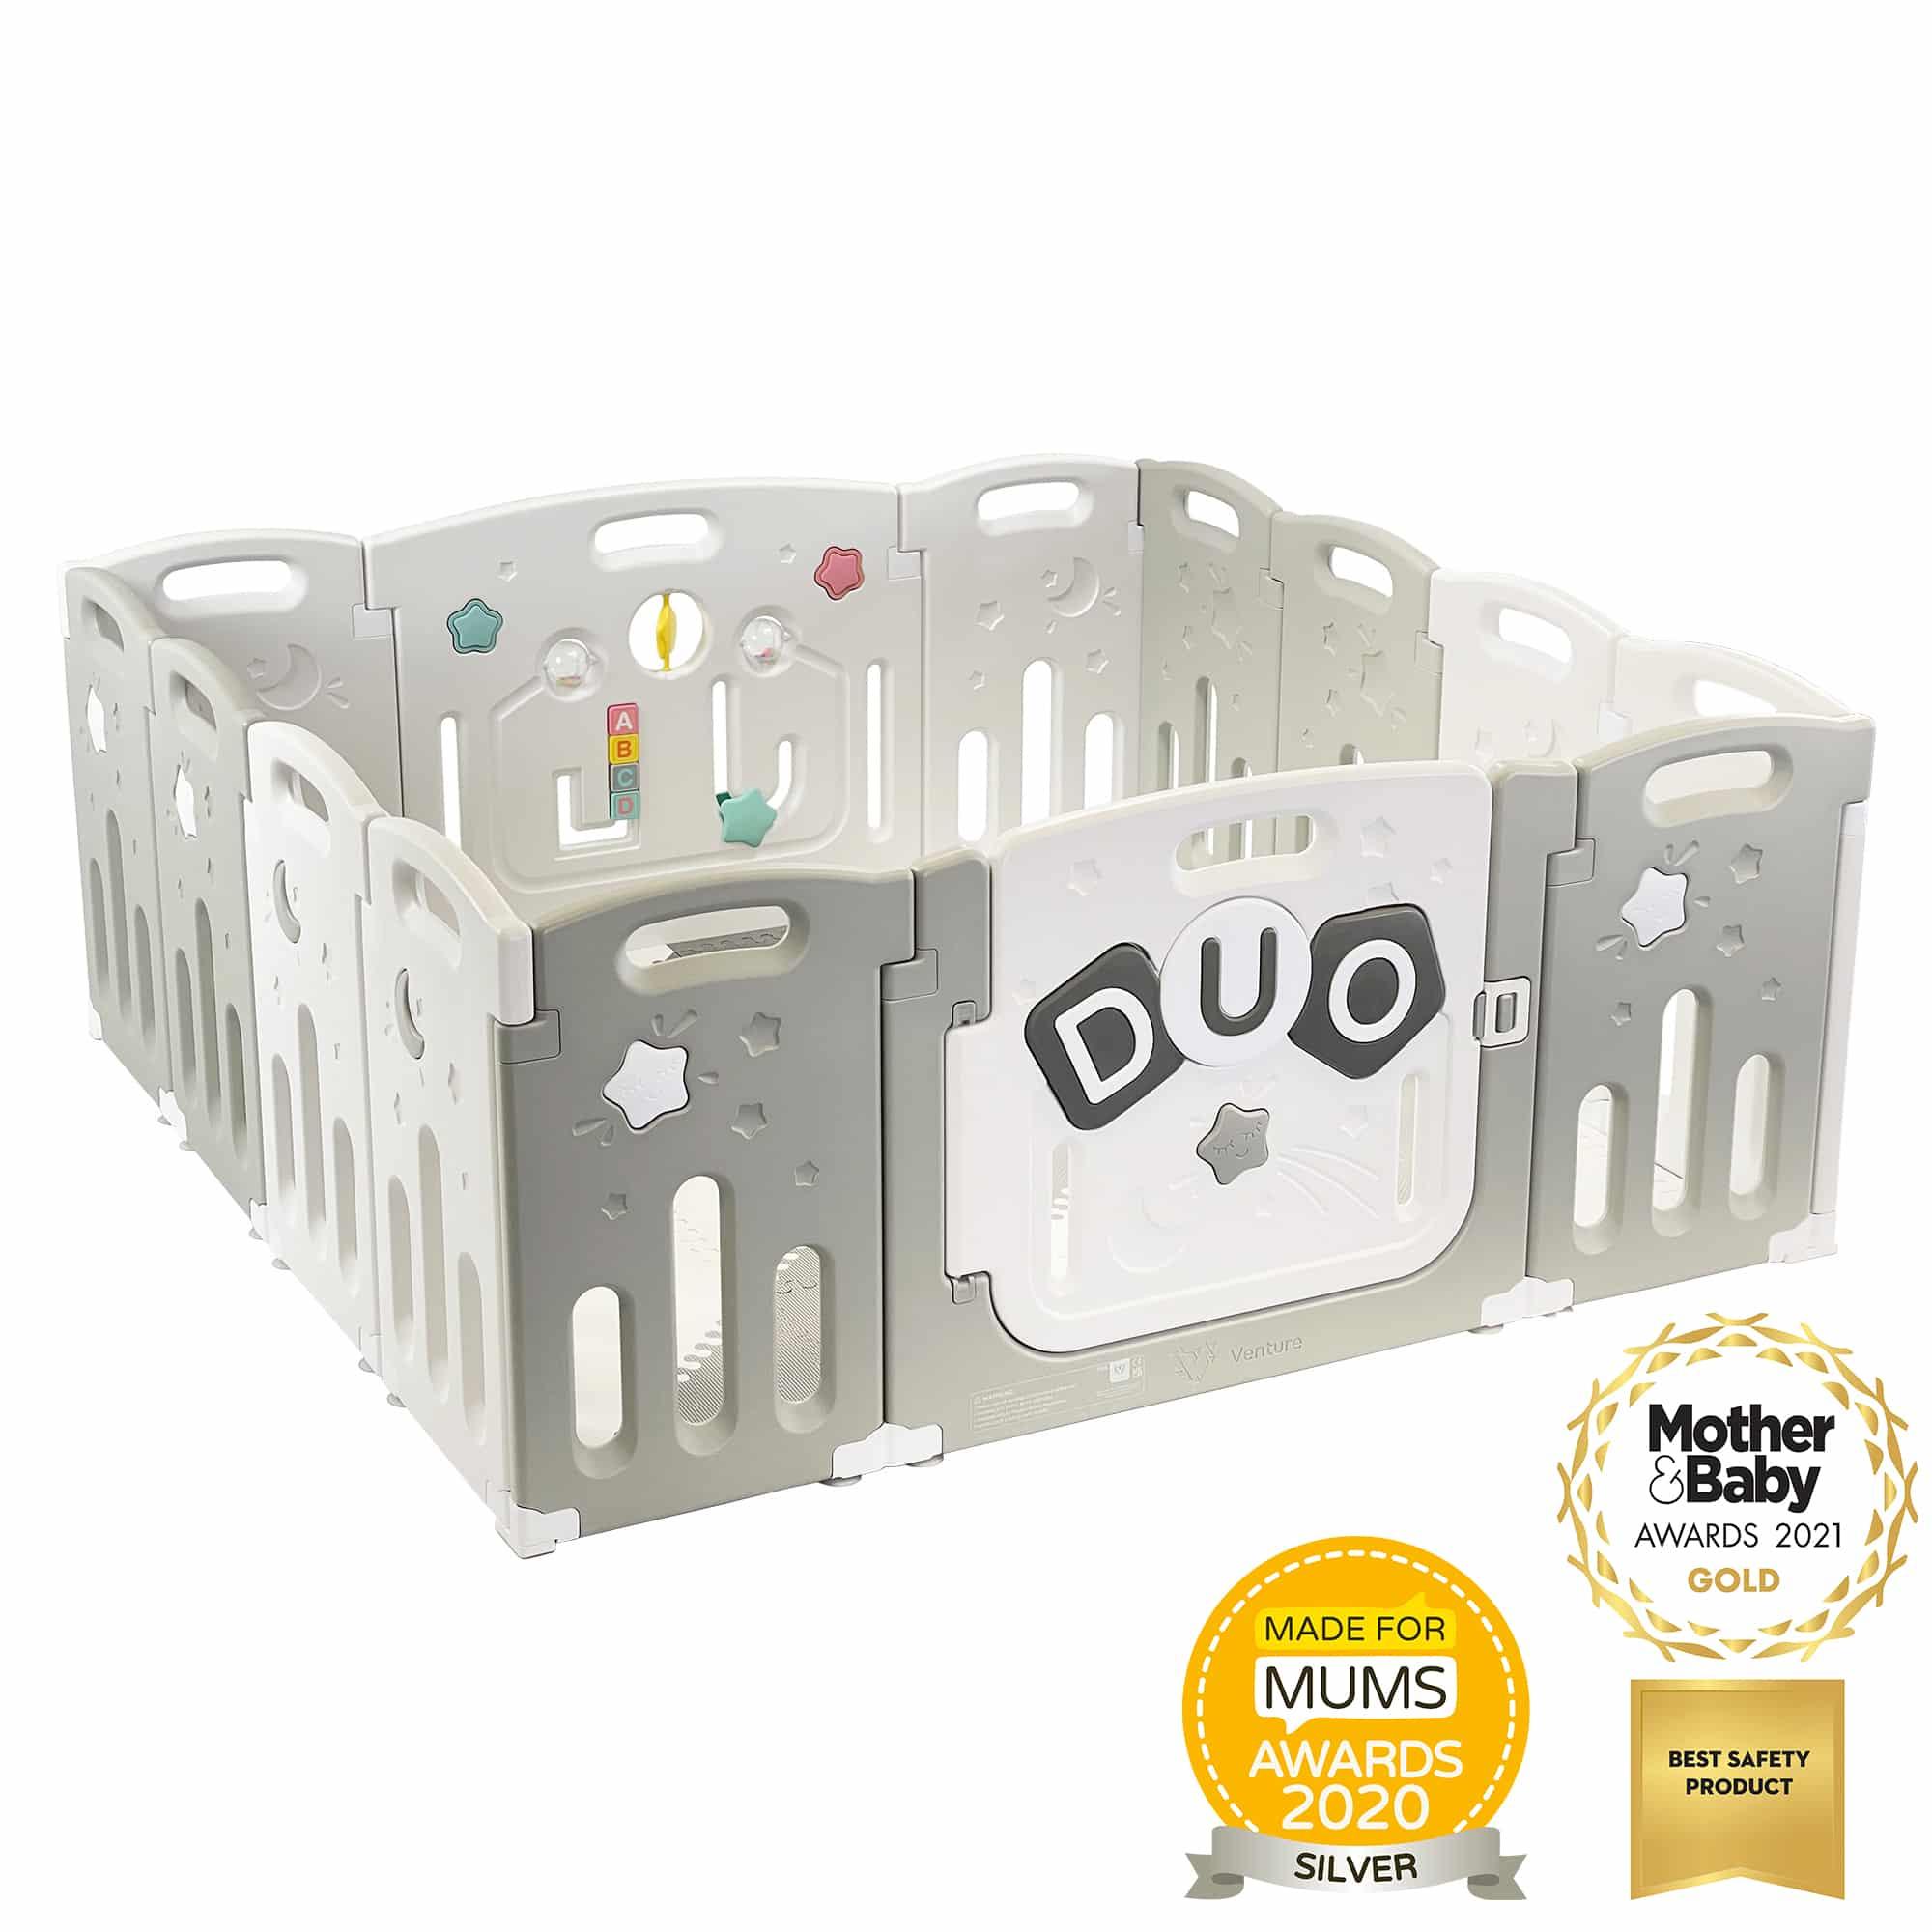 Award Winning Venture All Stars DUO Baby Playpen - Grey